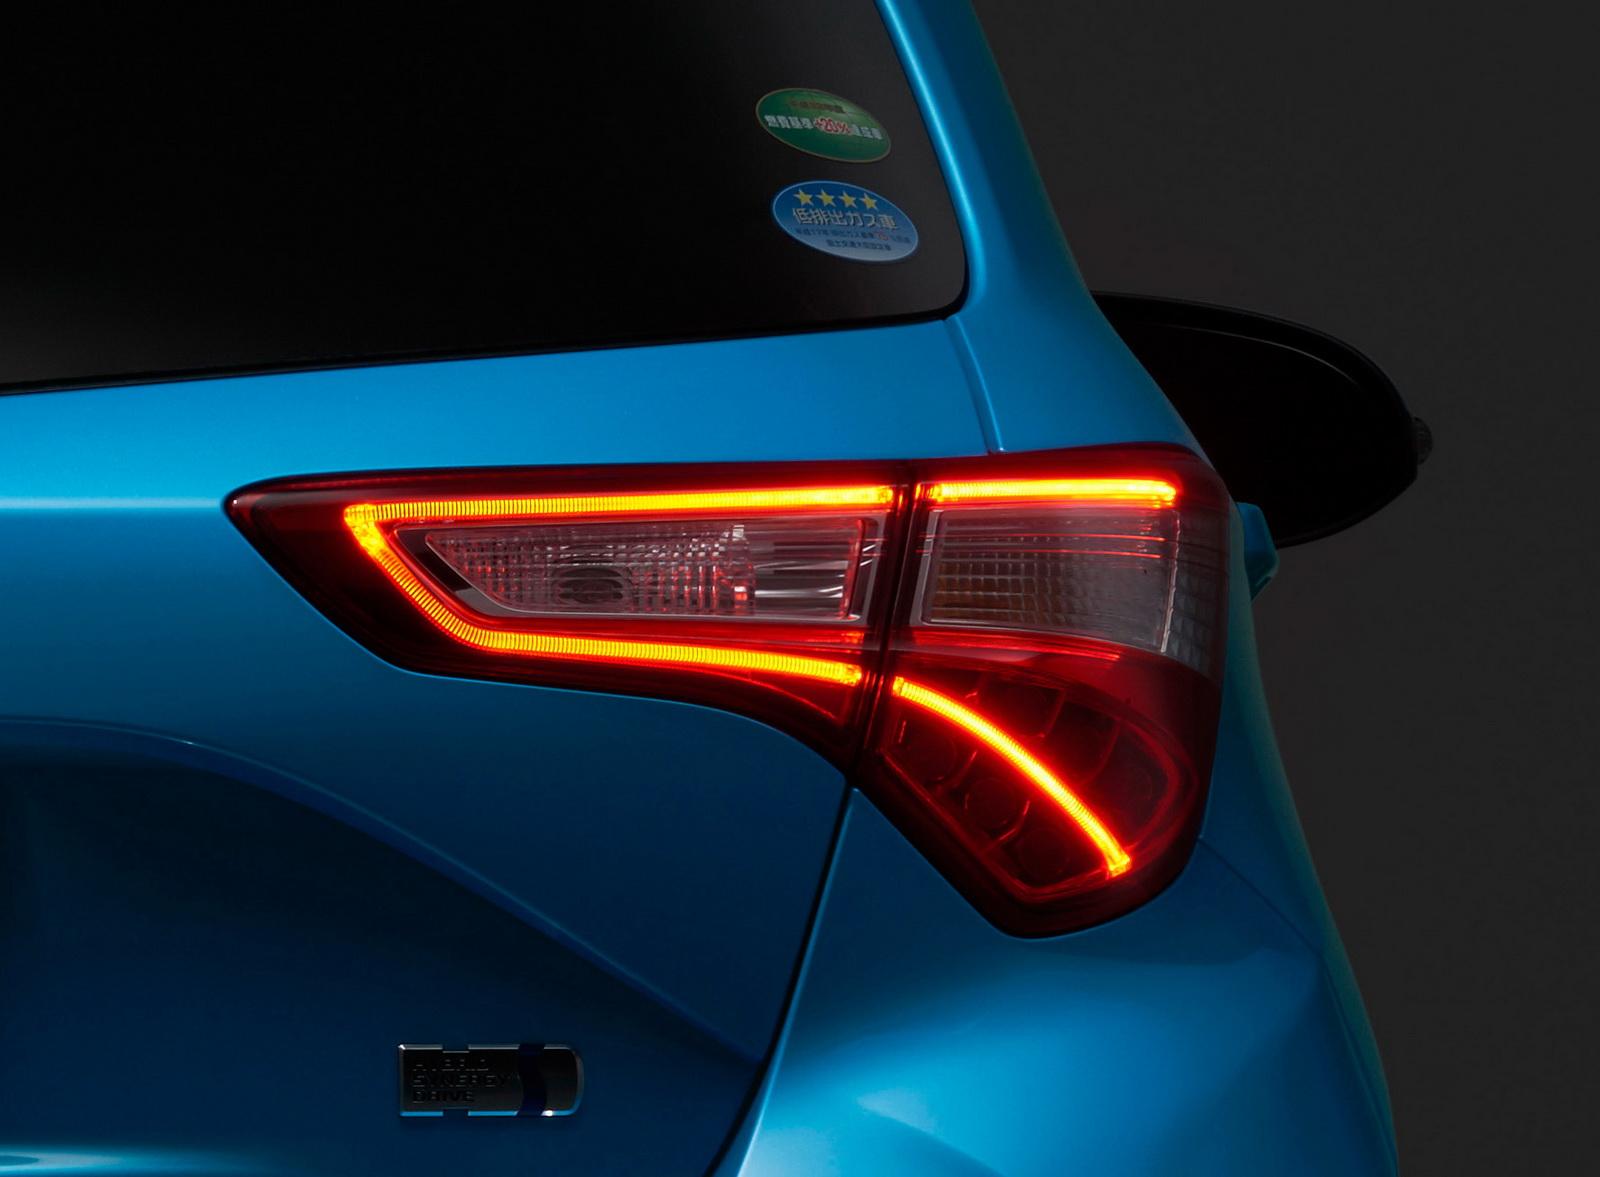 Toyota Yaris Trd Exhaust Lampu Belakang Grand New Avanza Gets 1 5l Petrol Engine Water Cooled